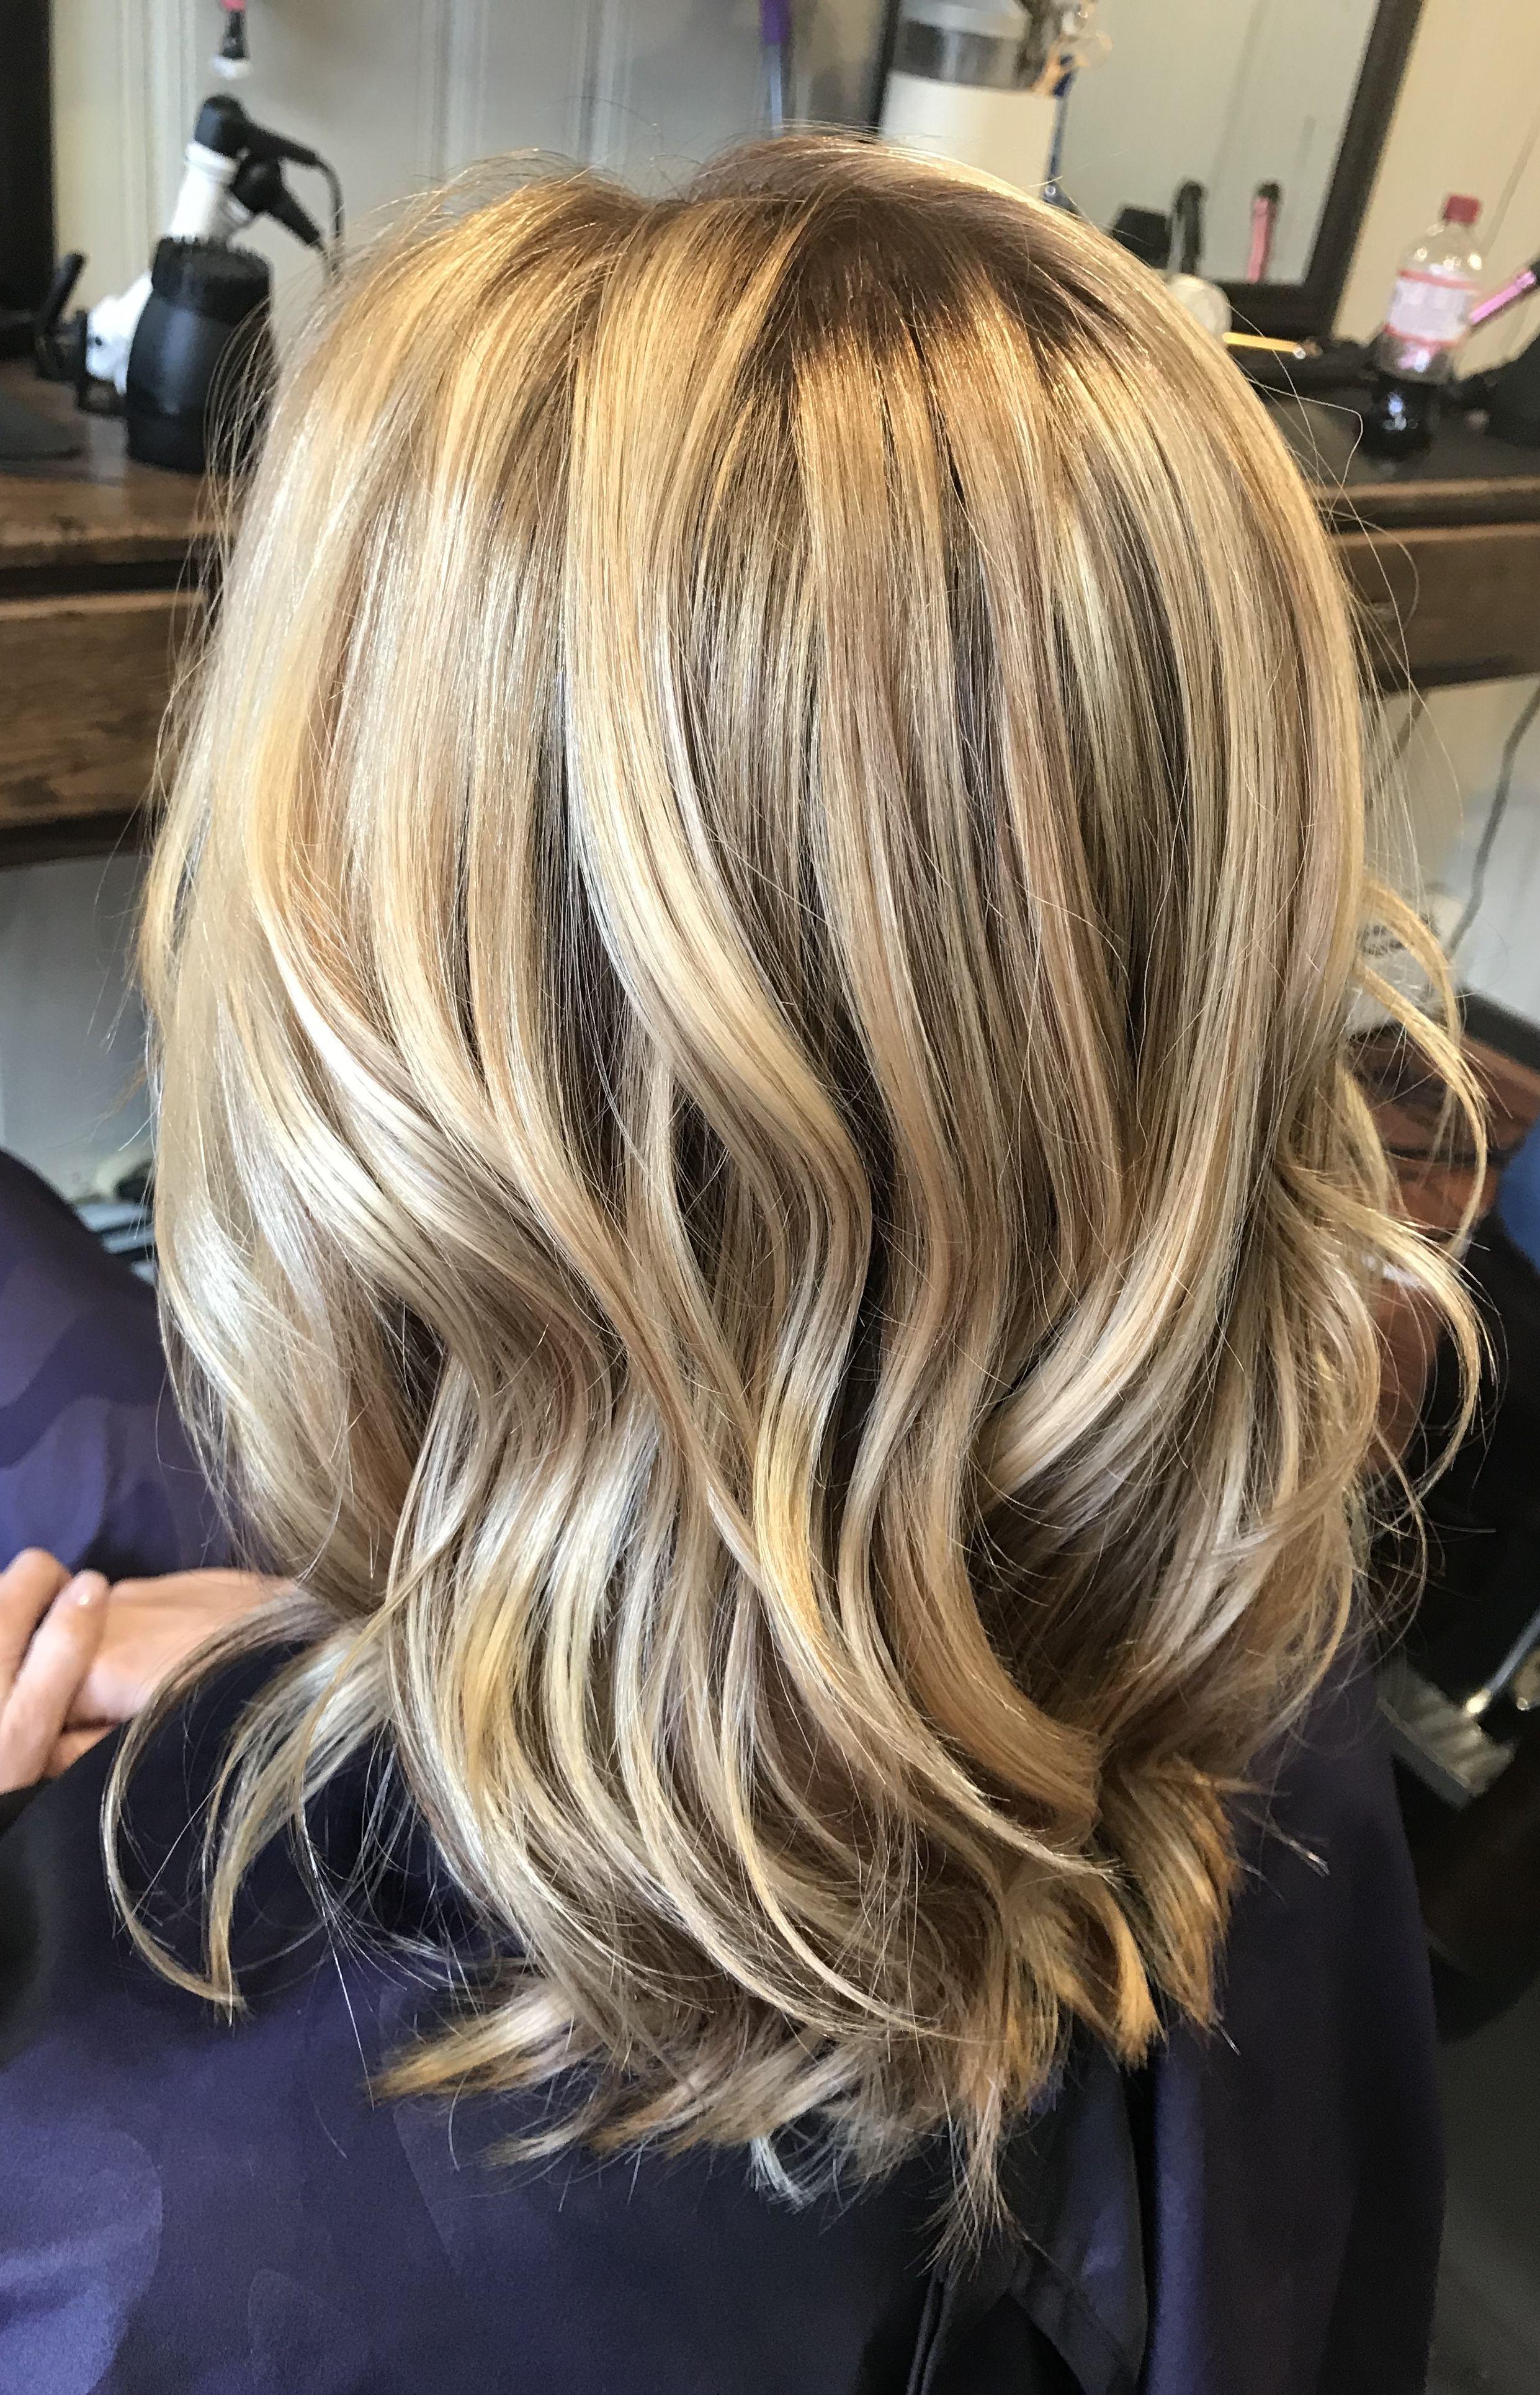 Bright Blonde Highlights On Dark Blonde Hair Color Blonde Hair